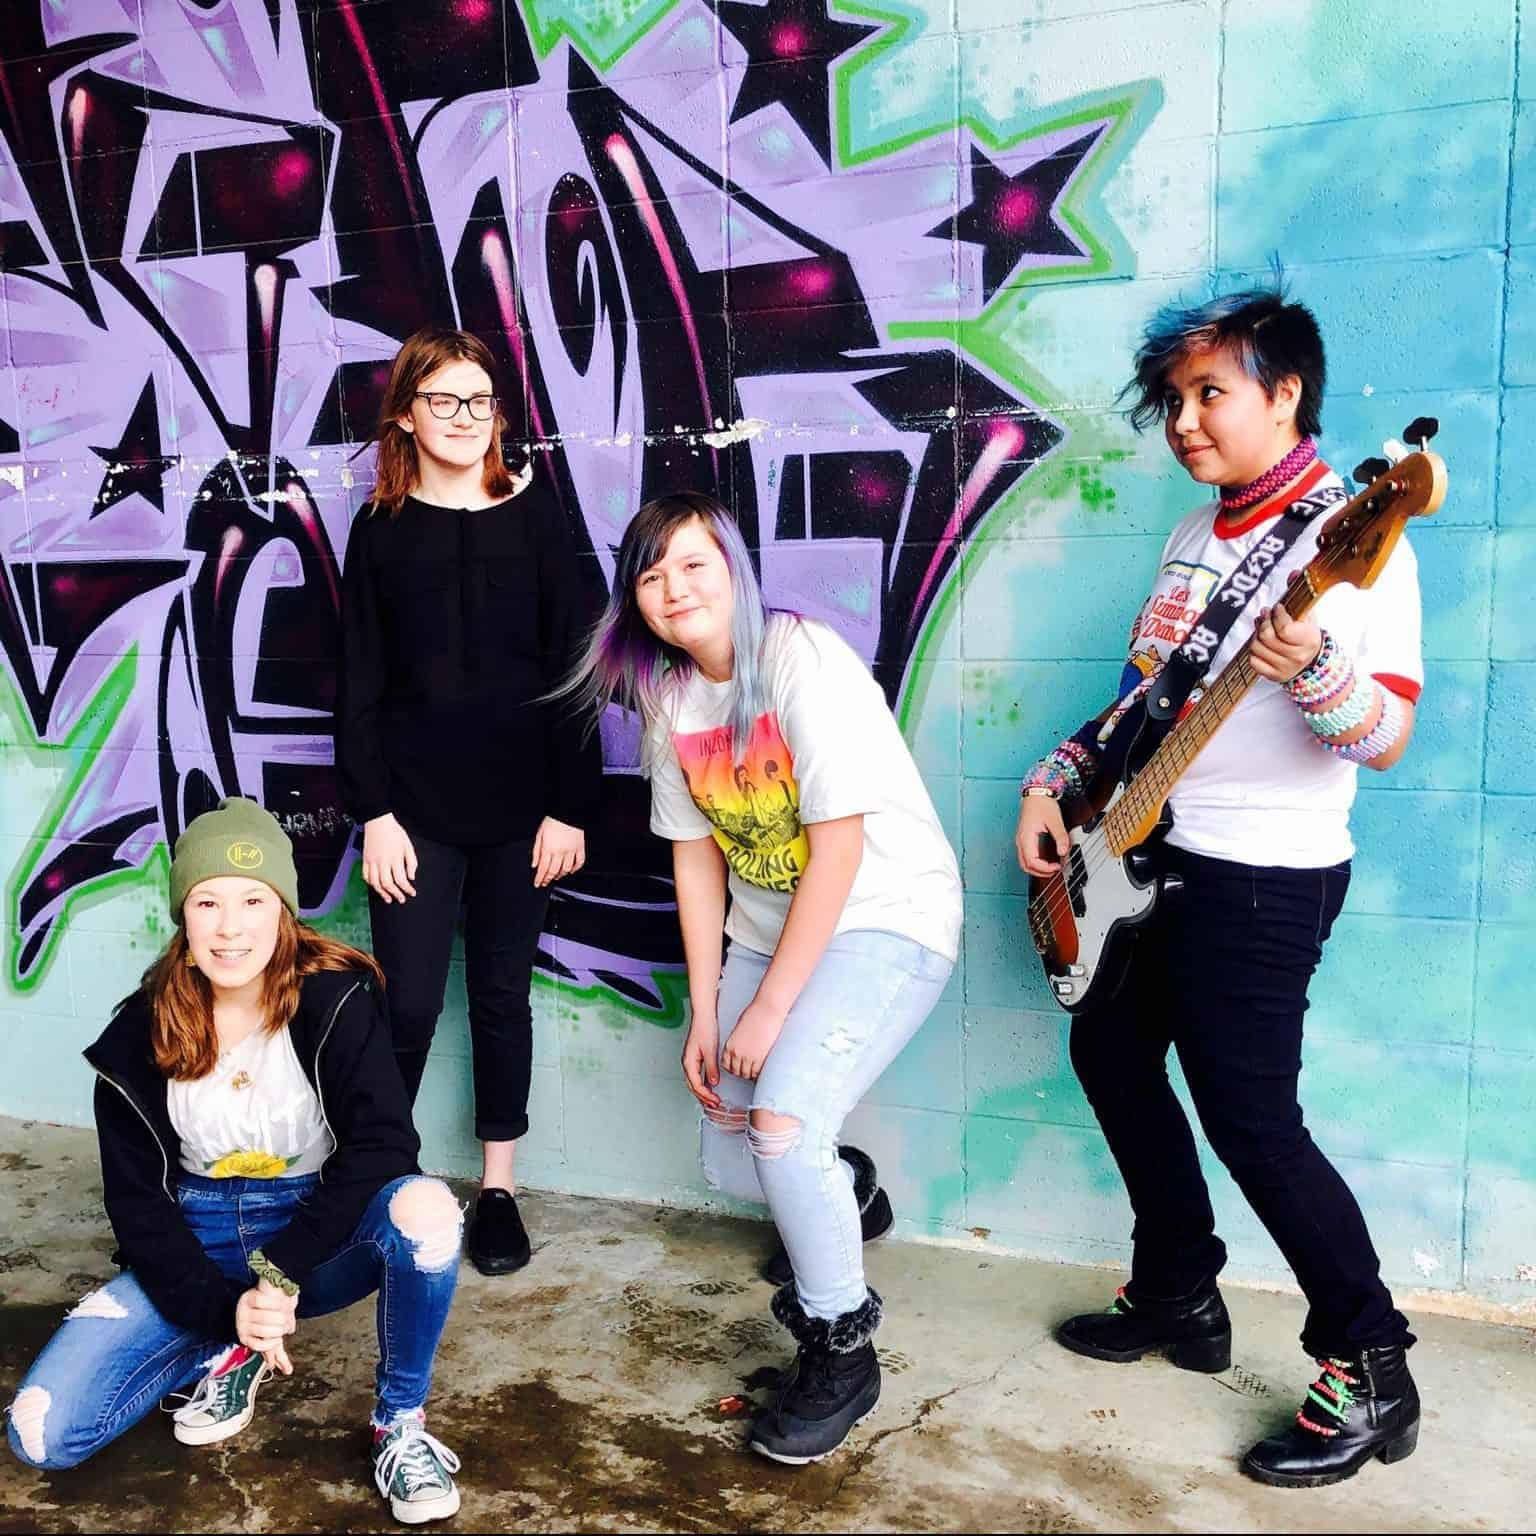 All Girl Rock Band in Edmonton